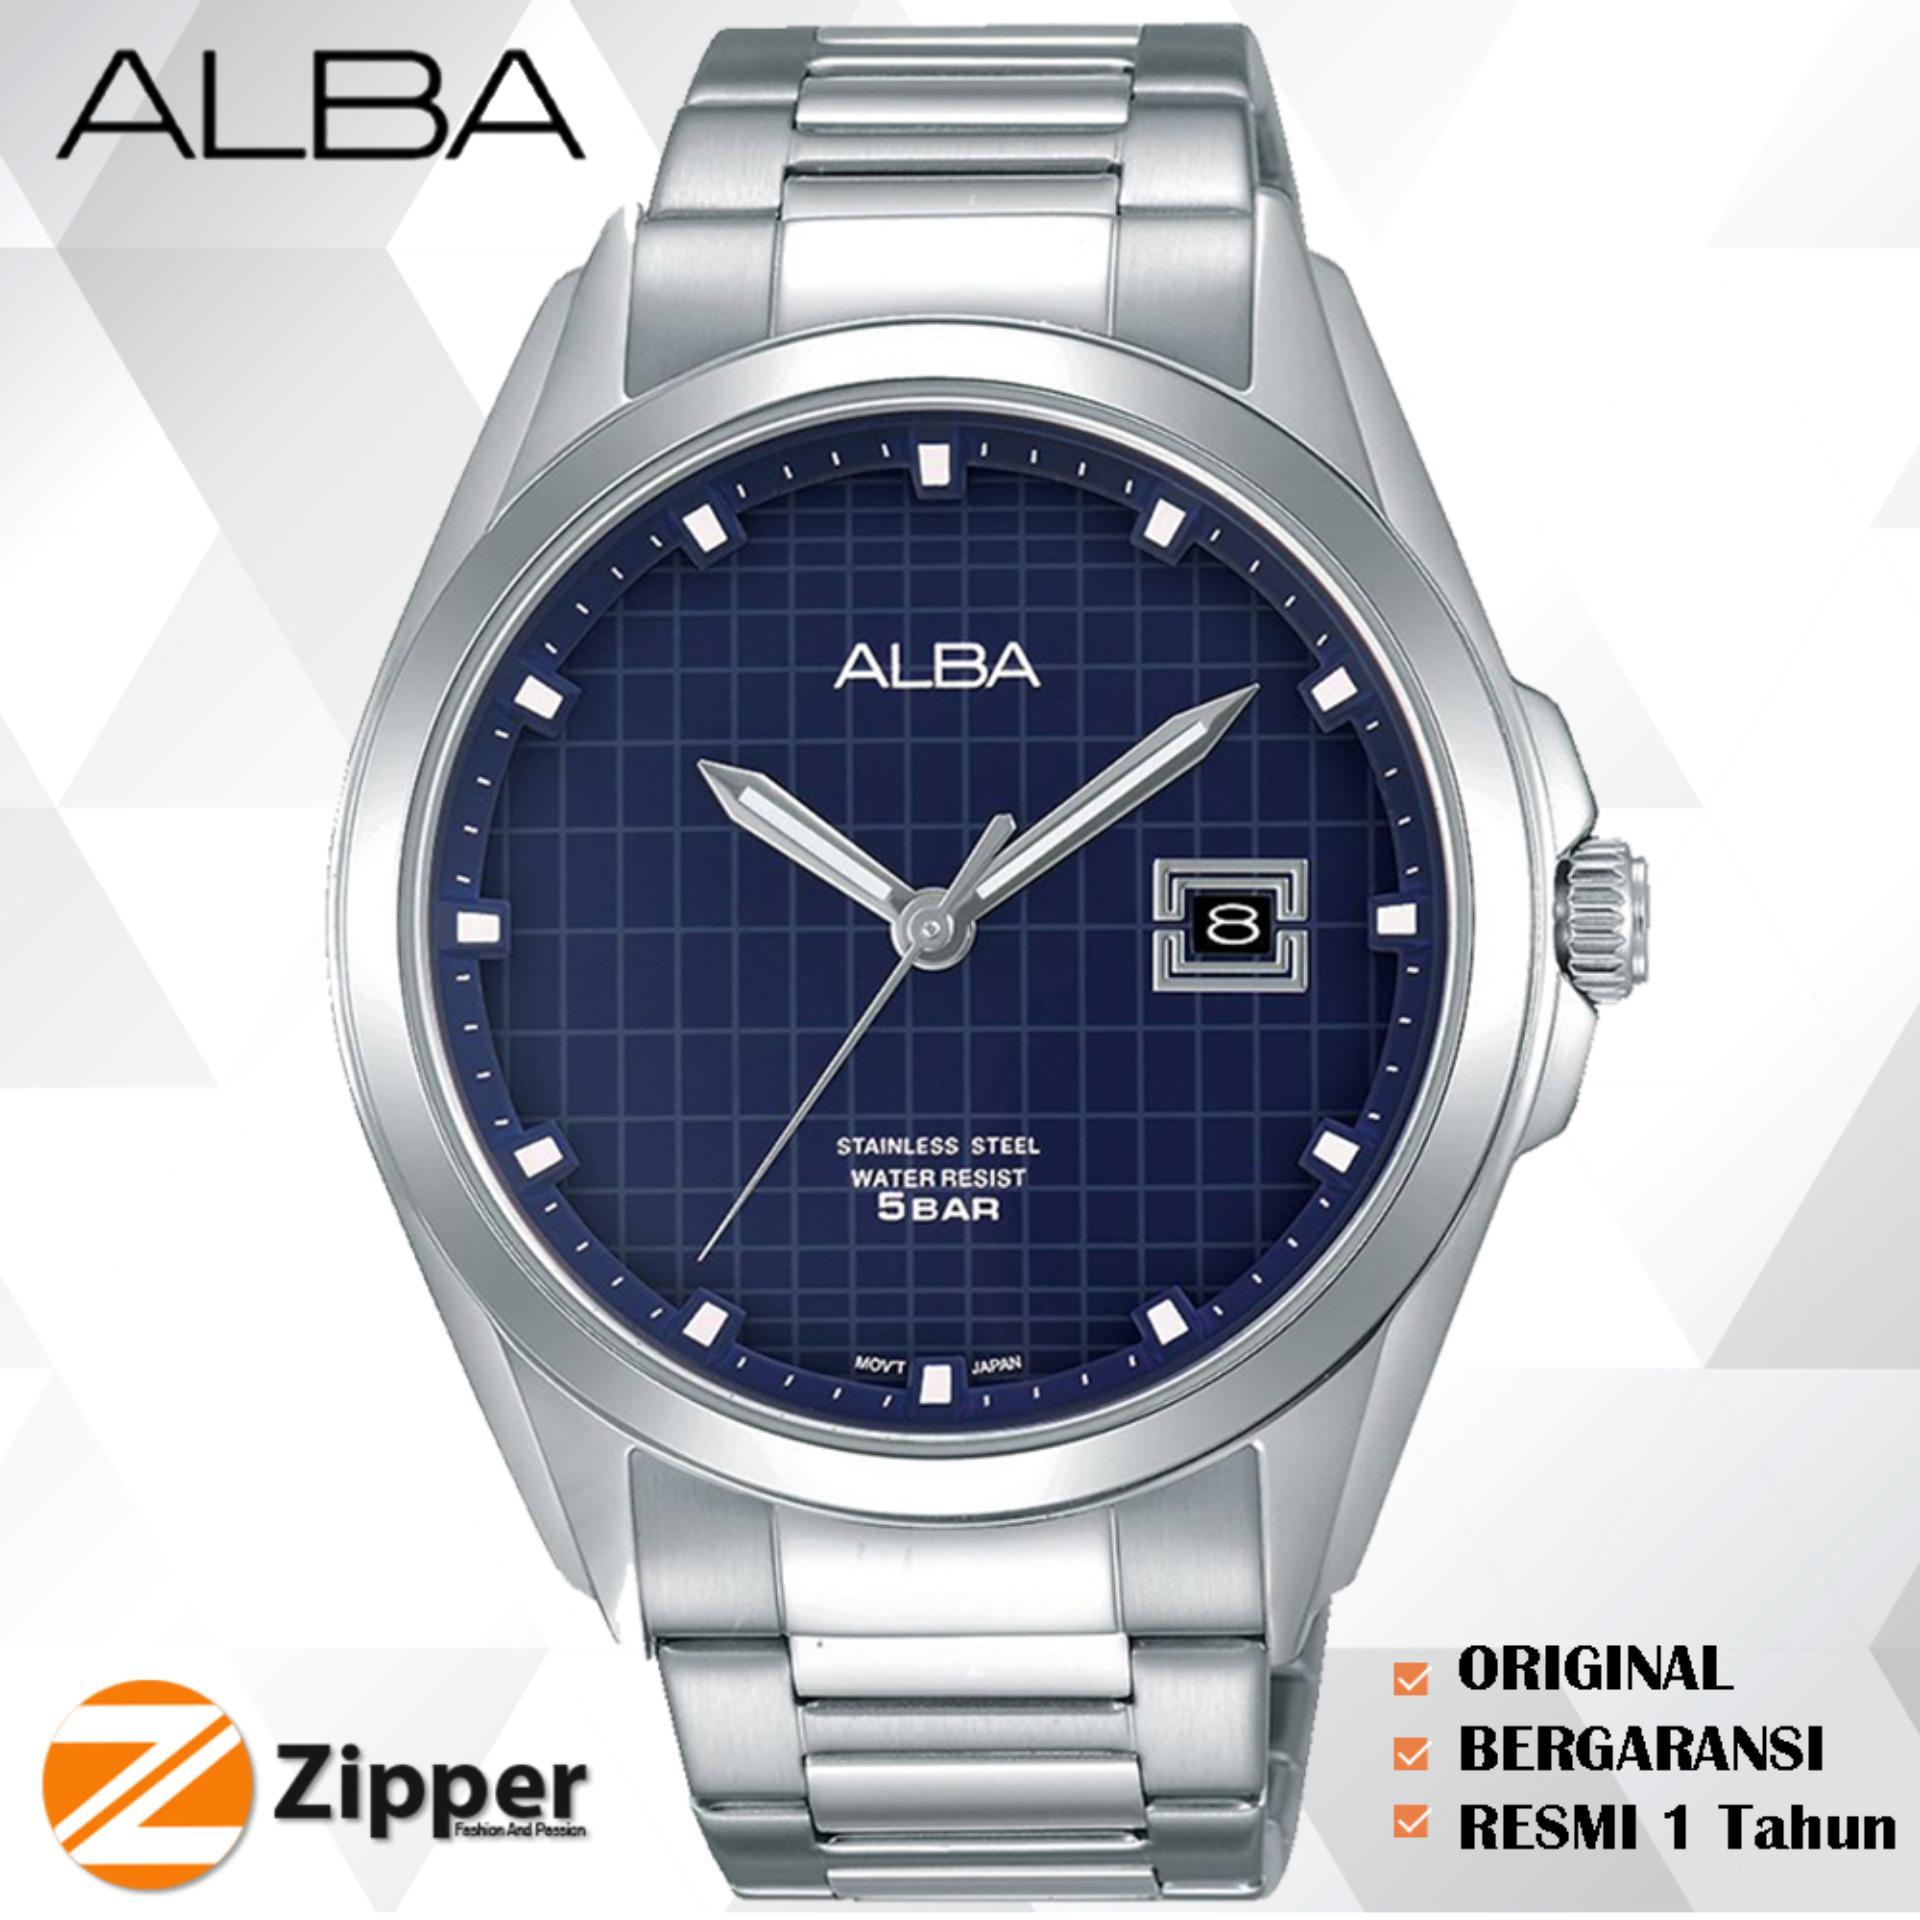 ALBA Pretige Jam Tangan Pria Tali Kulit / Stainless Steel Quartz Movement AS9C Series